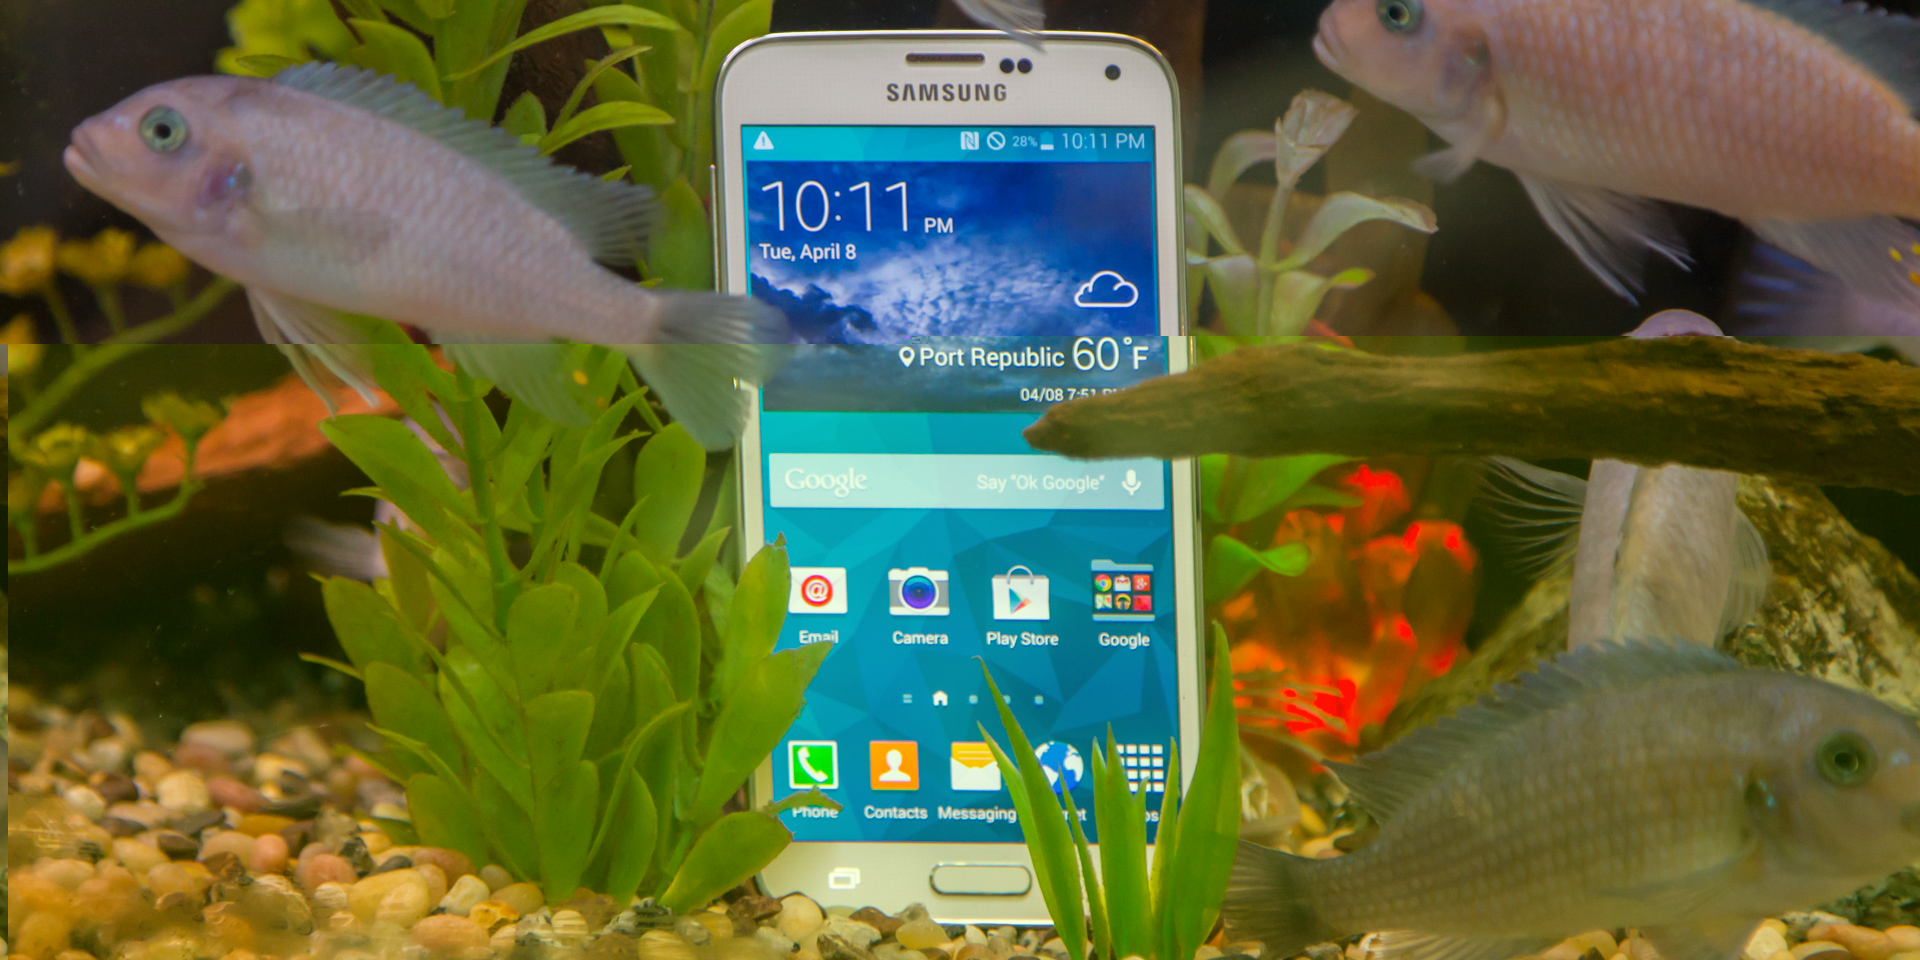 Samsung-galaxy-s5-g900h-cong-ty-chong-nuoc